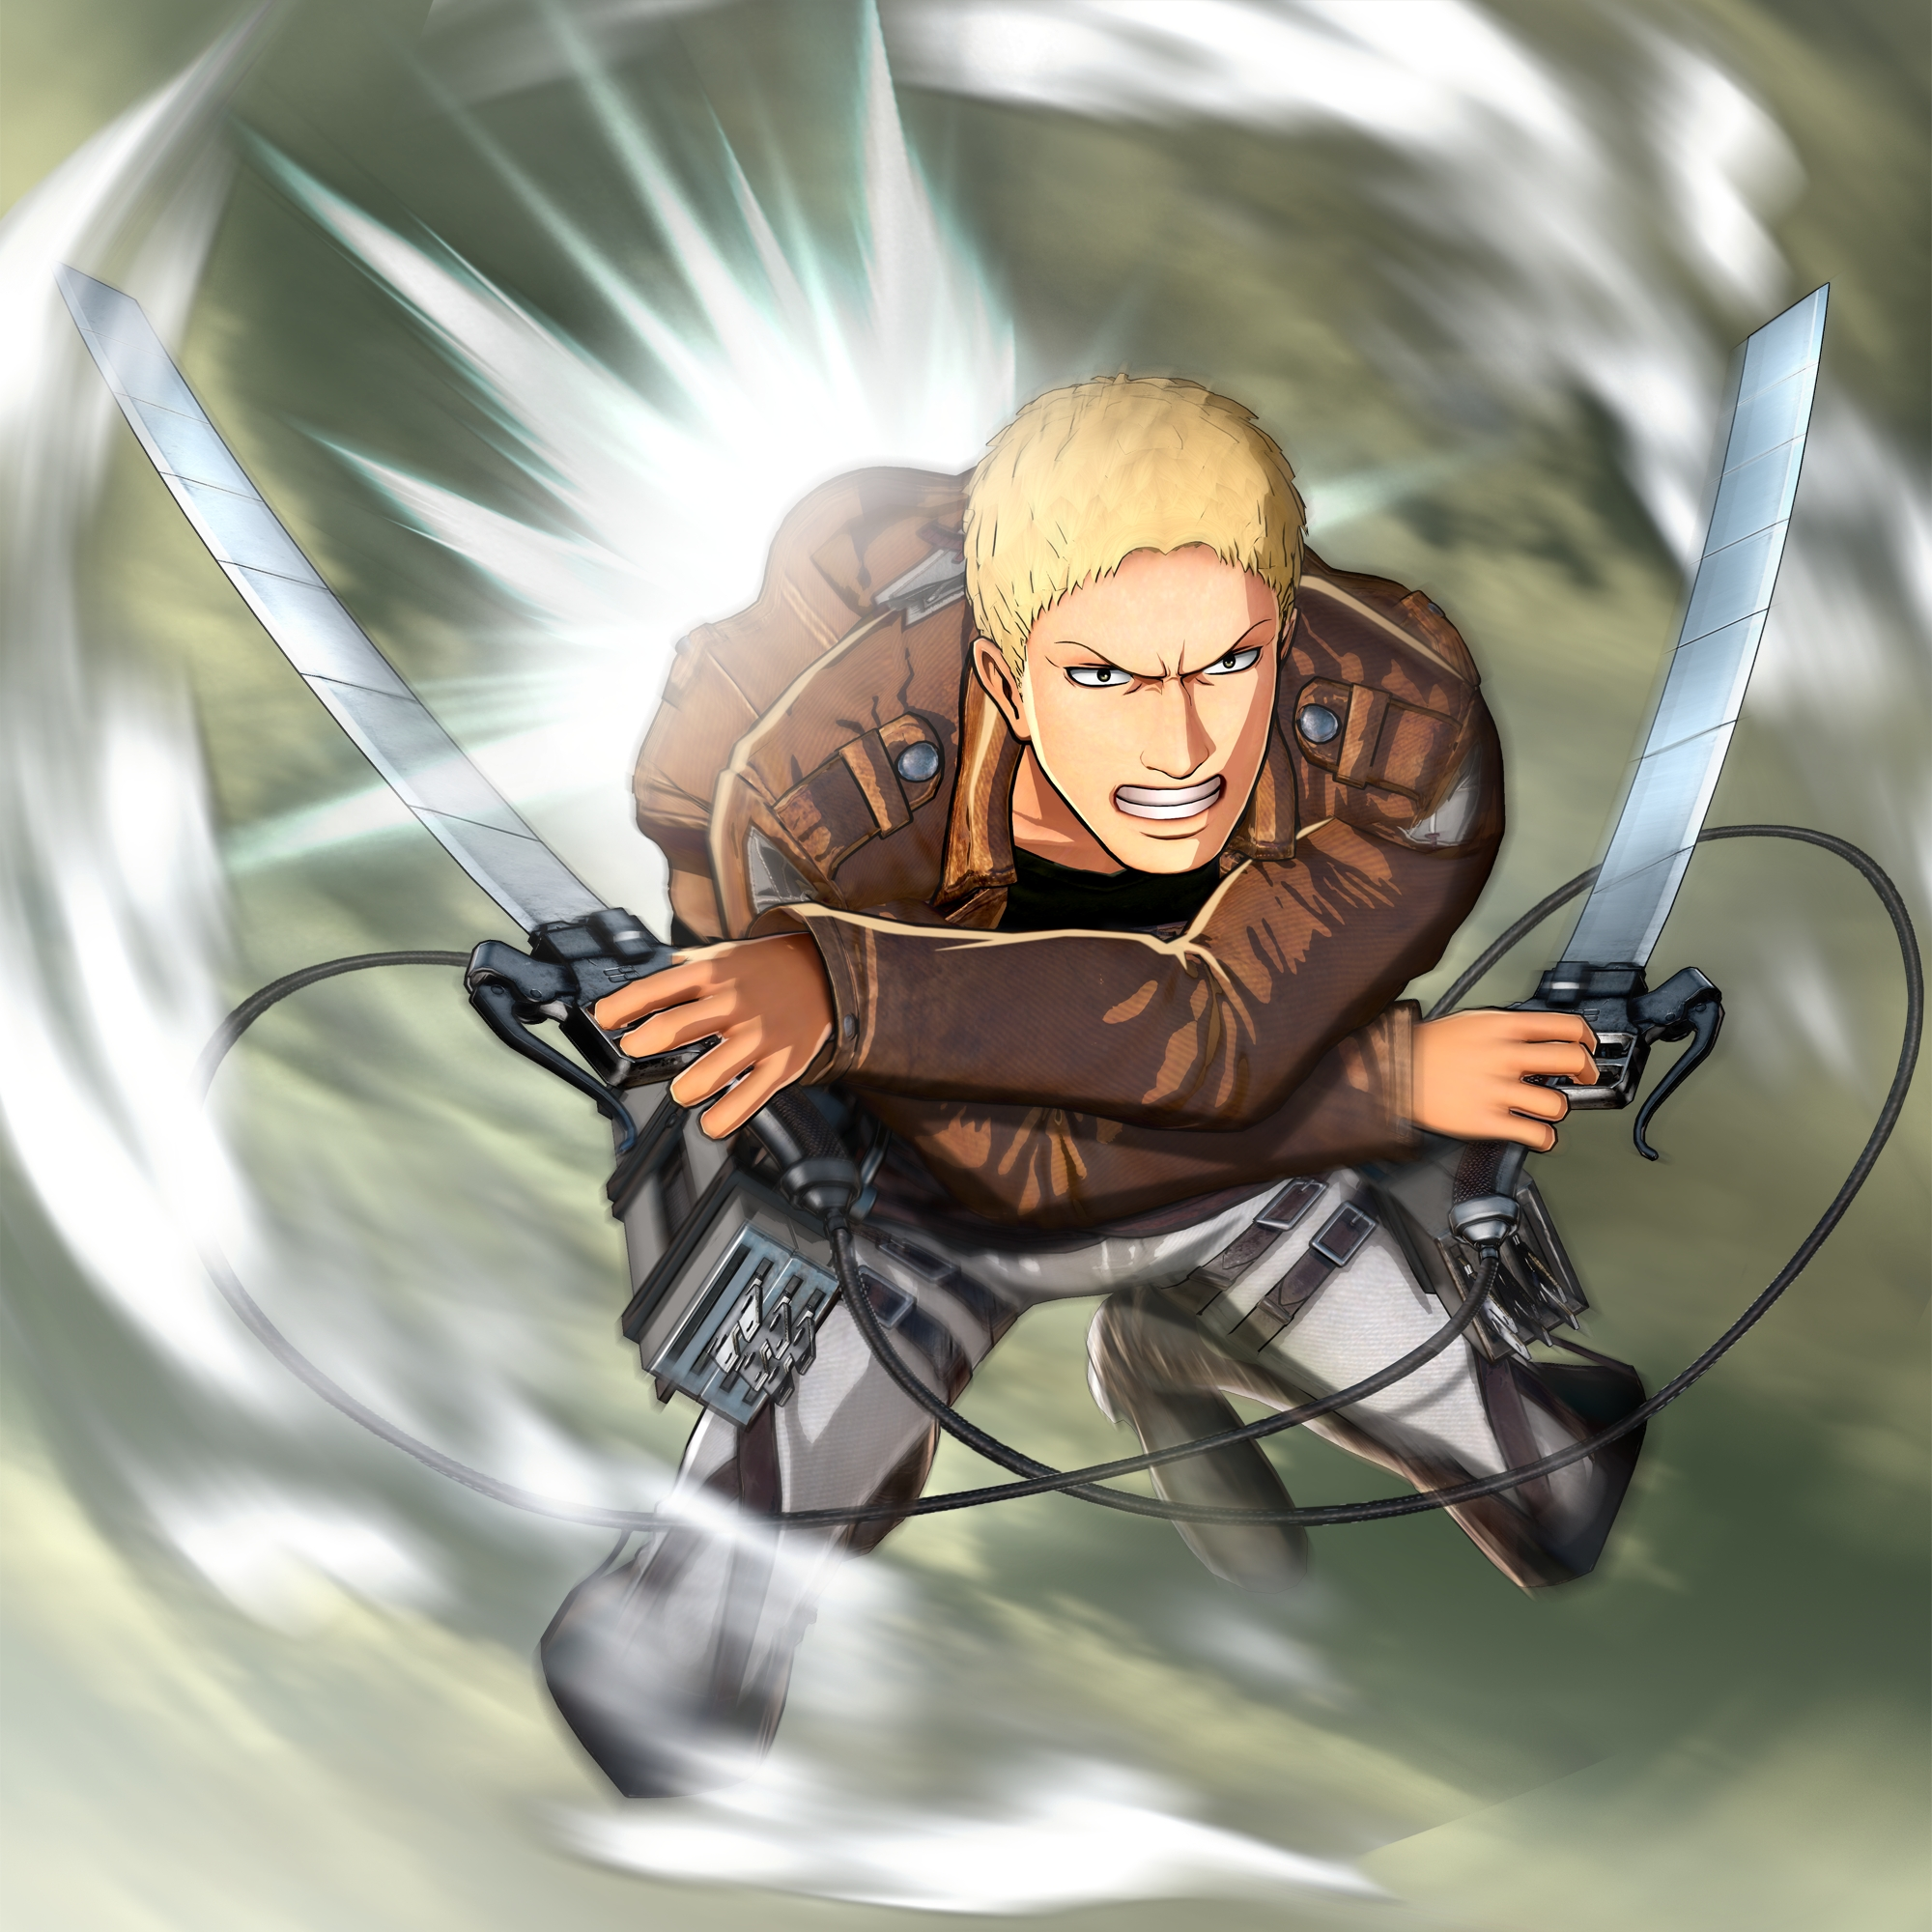 Attack on titan release date